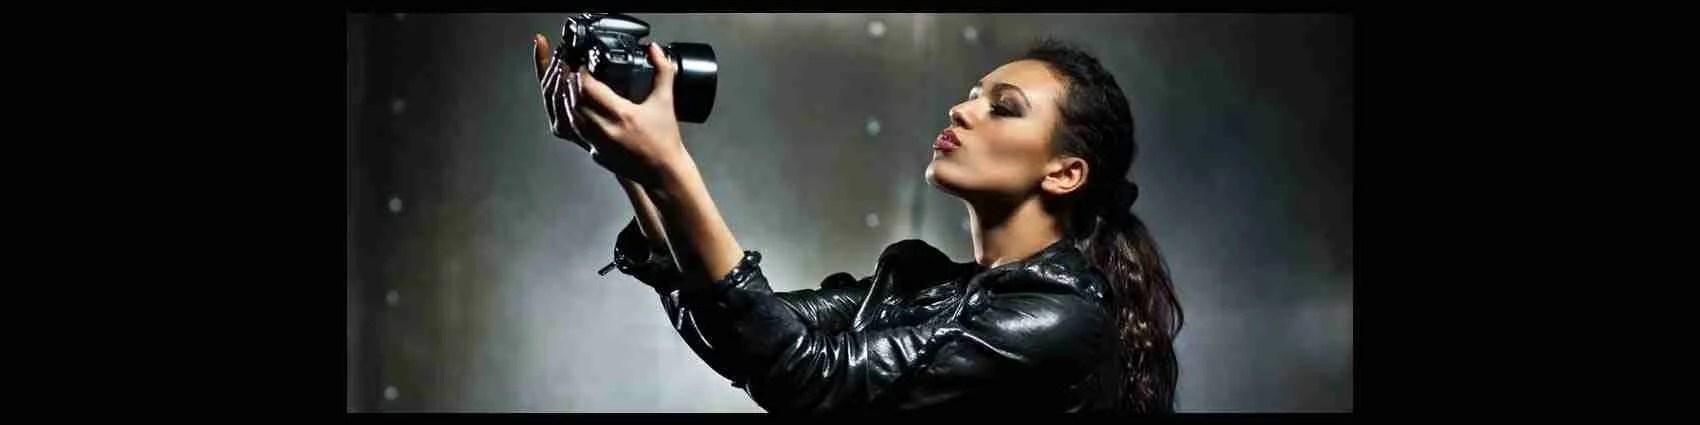 Video personale top escort. Magica Escort